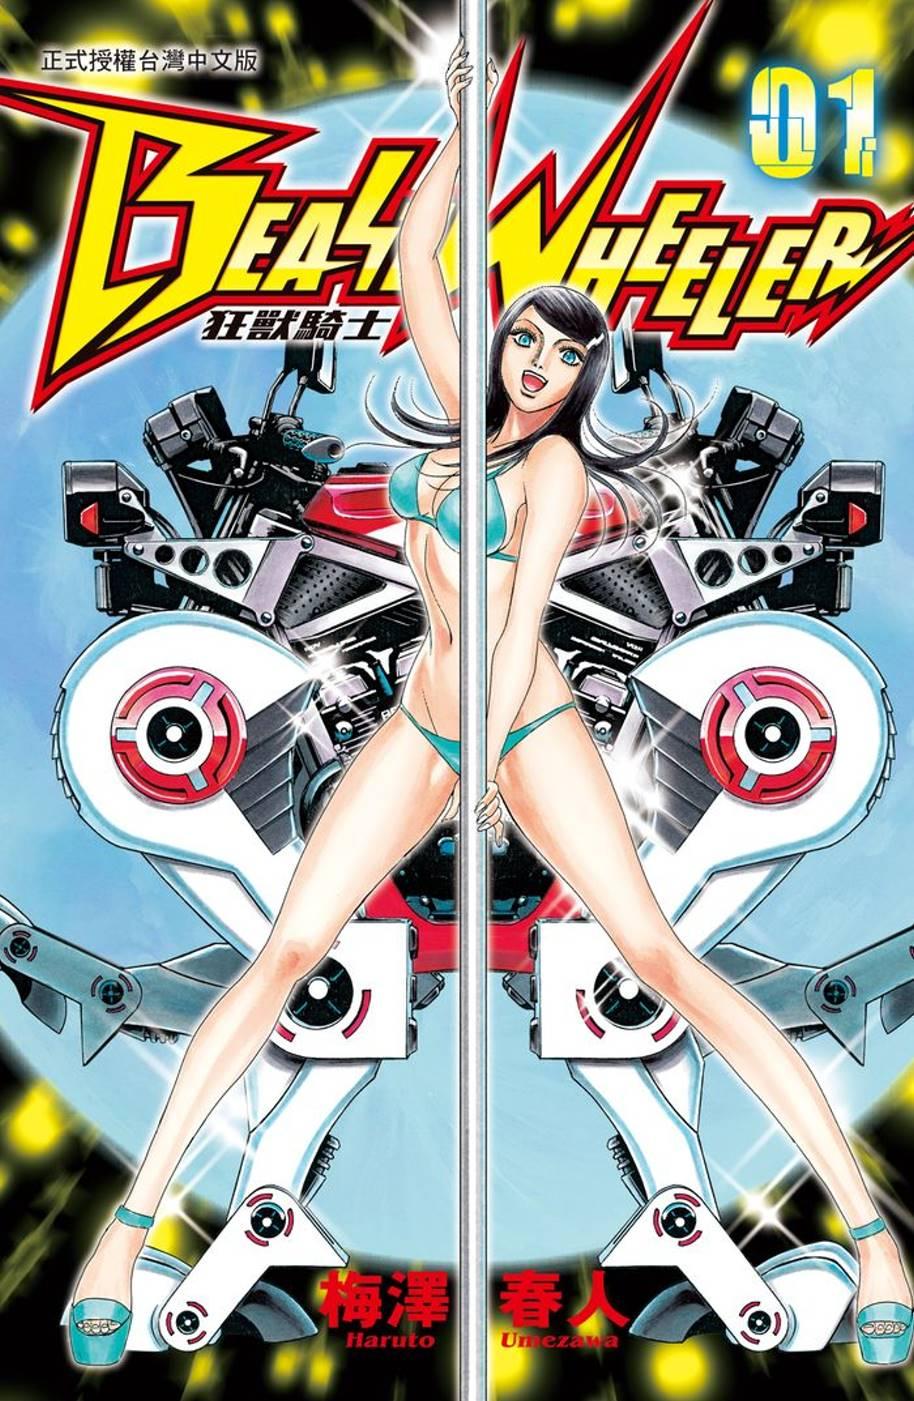 BEAST WHEELER-狂獸騎士- 1